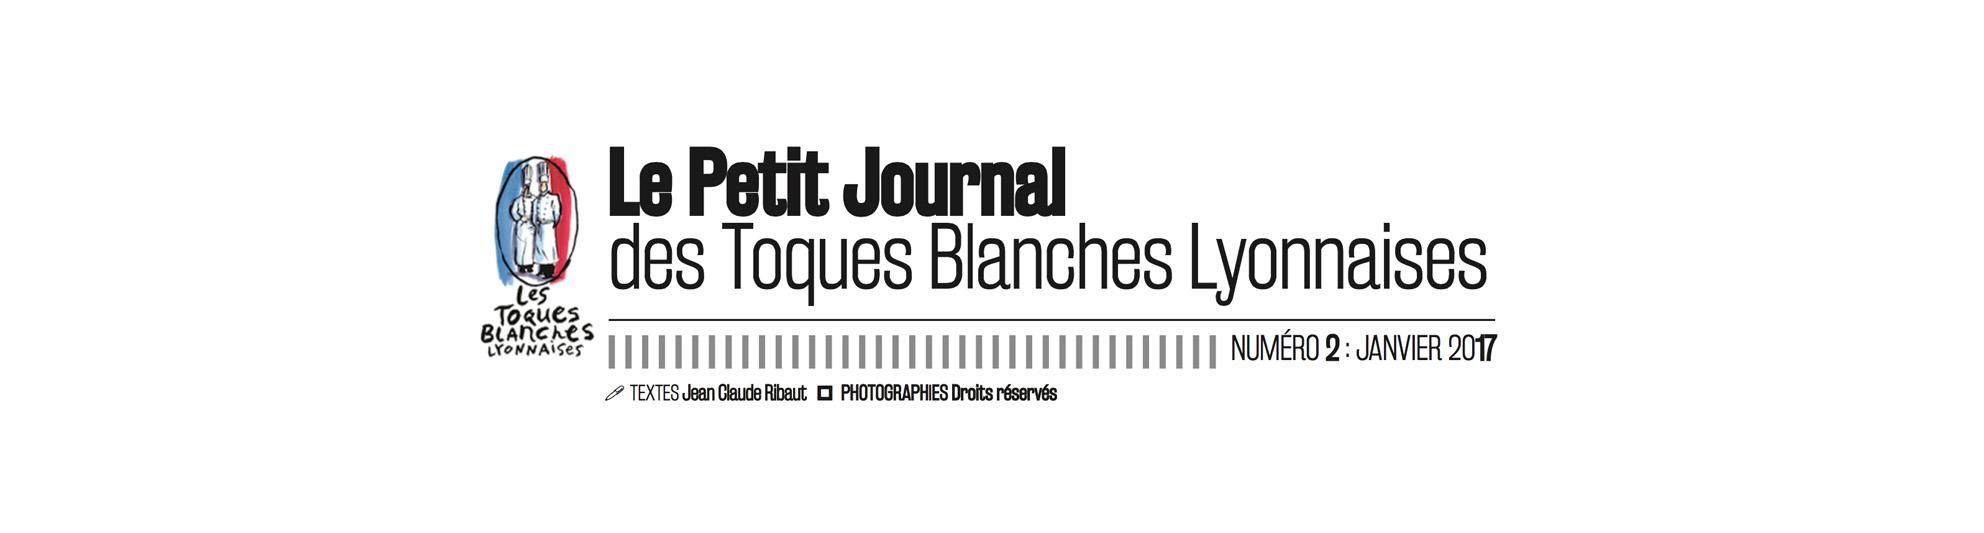 Le petit journal des Toques Blanches Lyonnaises N°2 : Spécial SIRHA